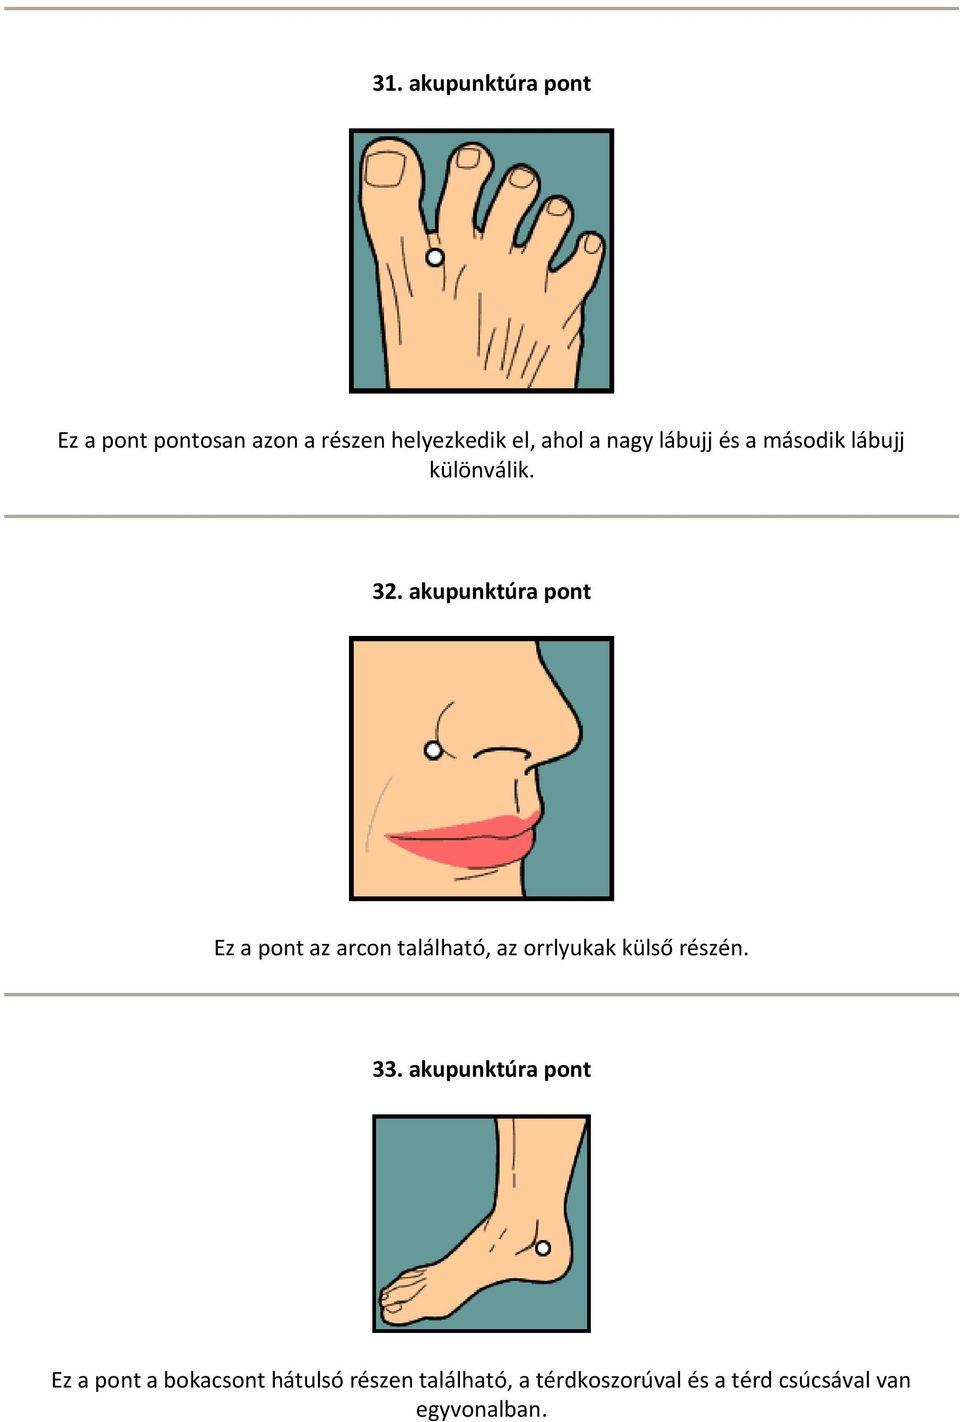 akupunktúrás pontok visszér